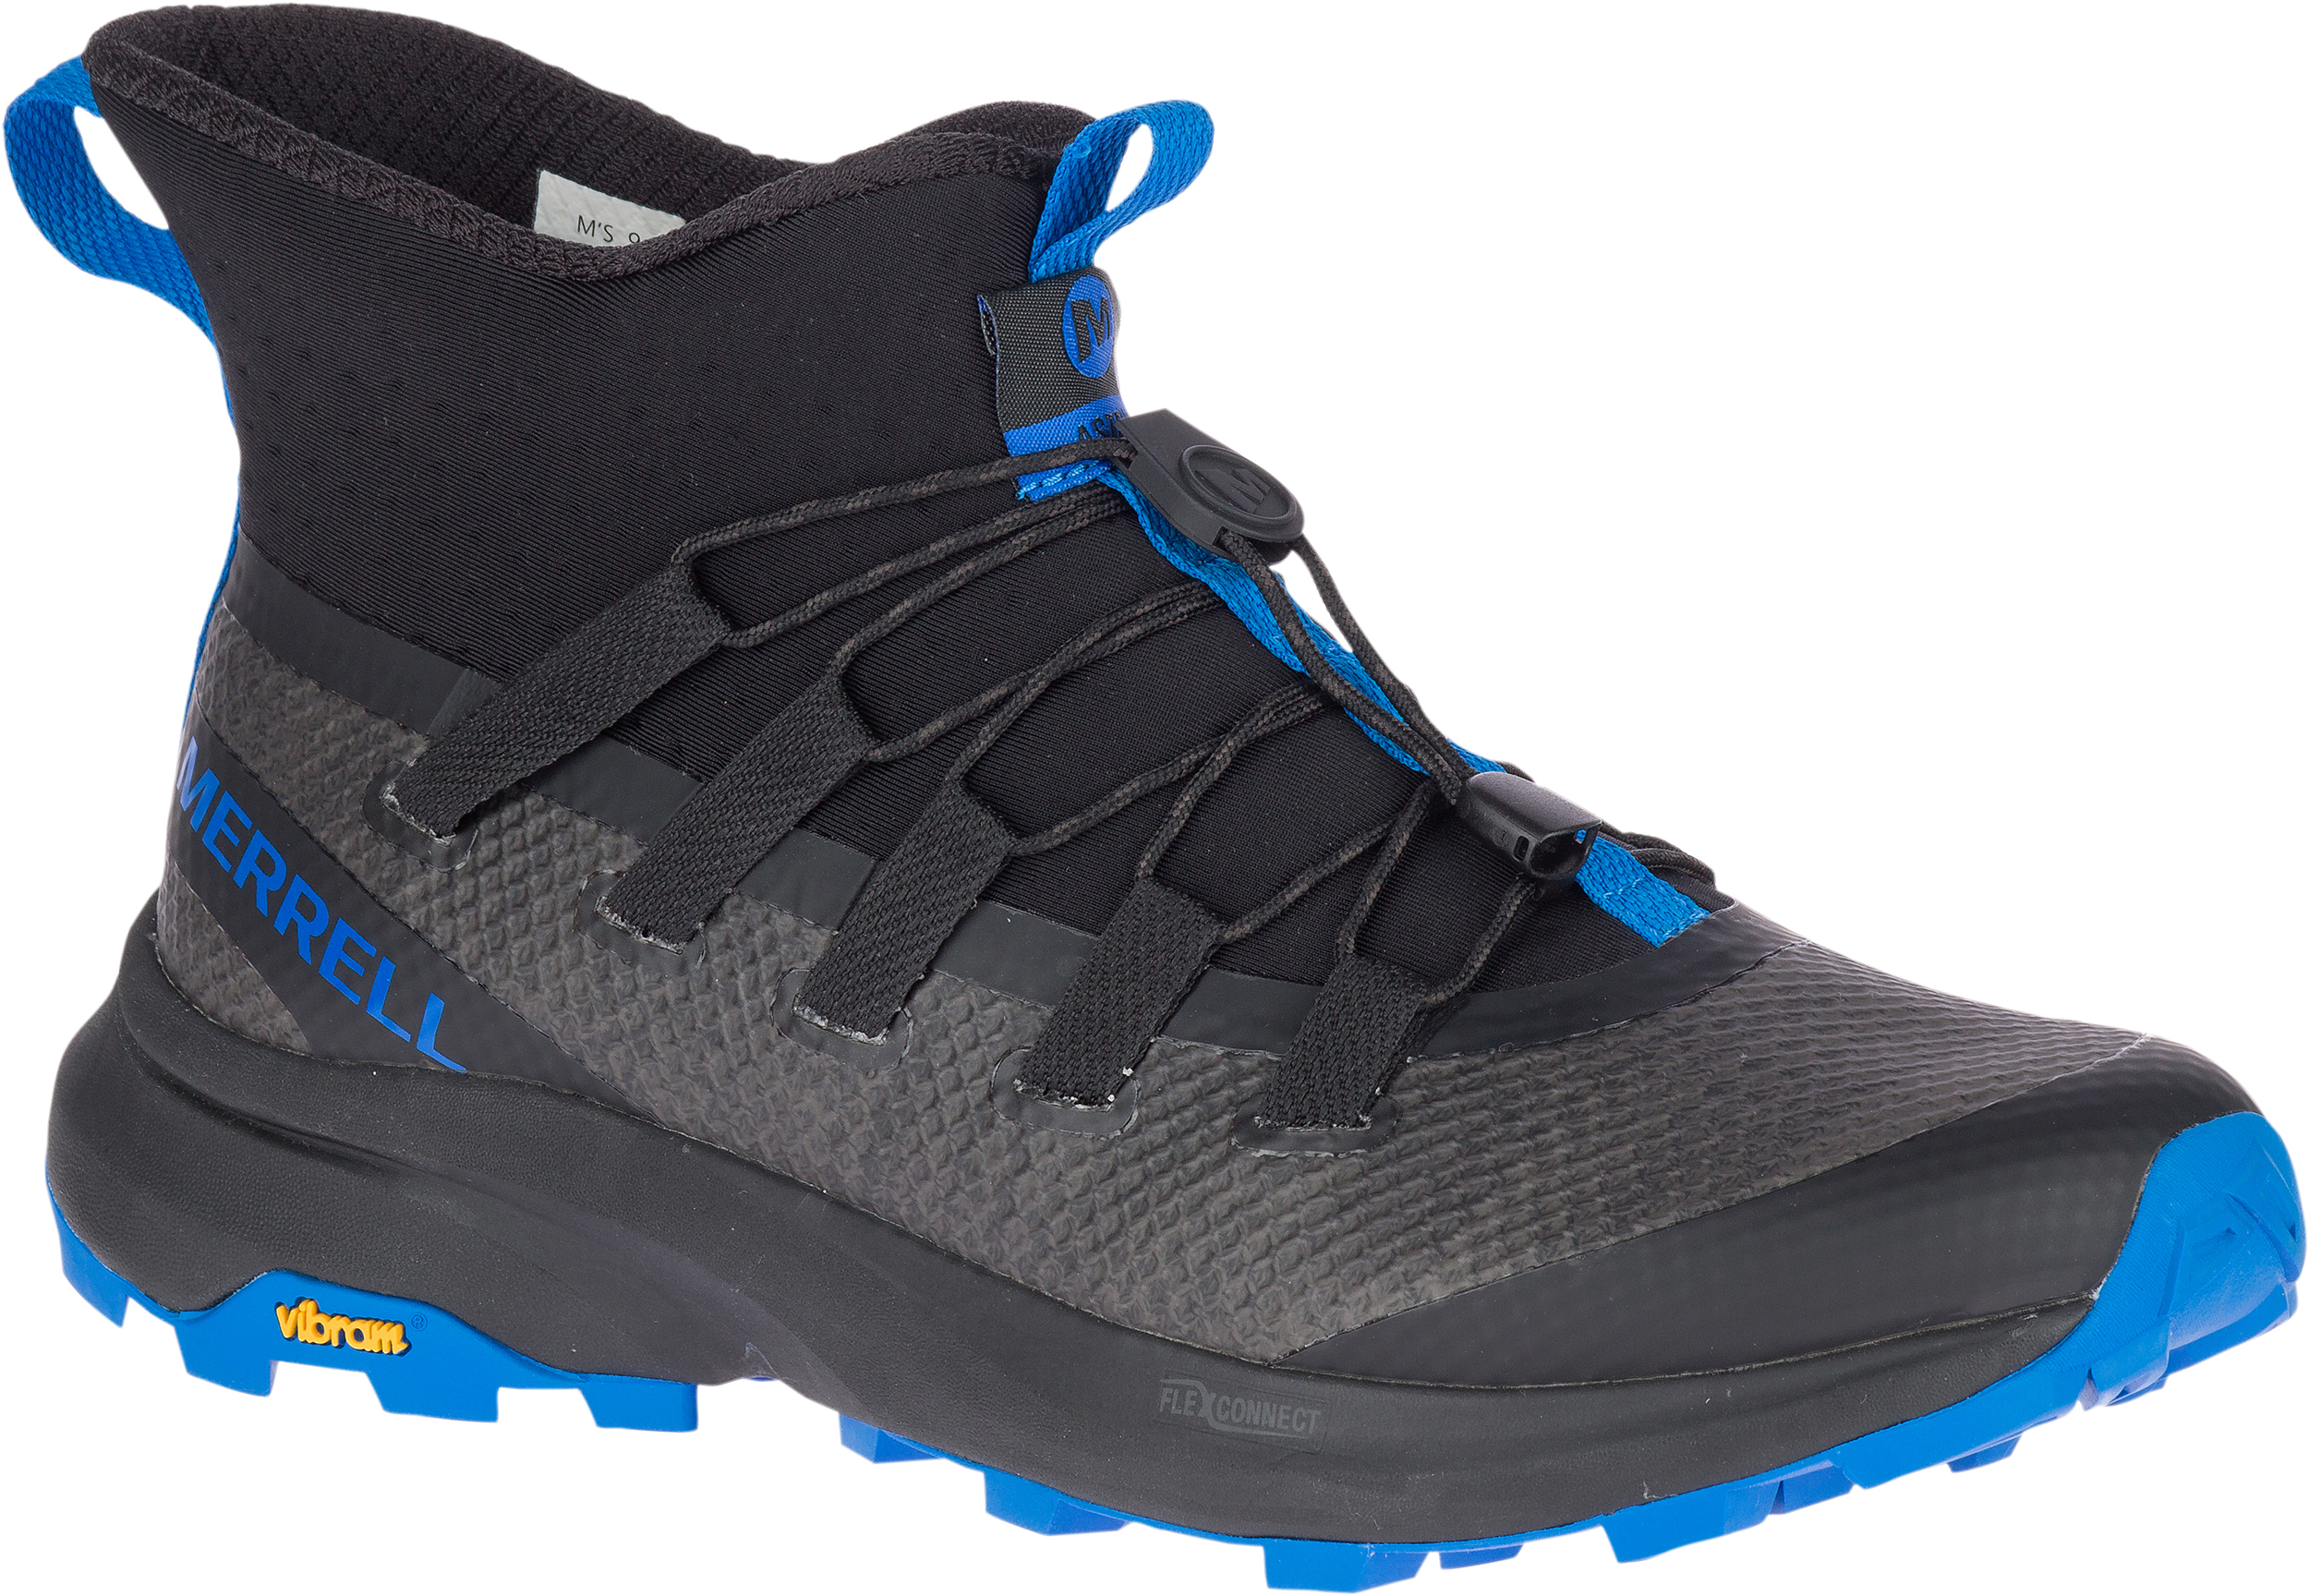 2018 sneakers new concept uk availability Merrell MTL Astrum Winter Trail Running Shoes - Men's | MEC